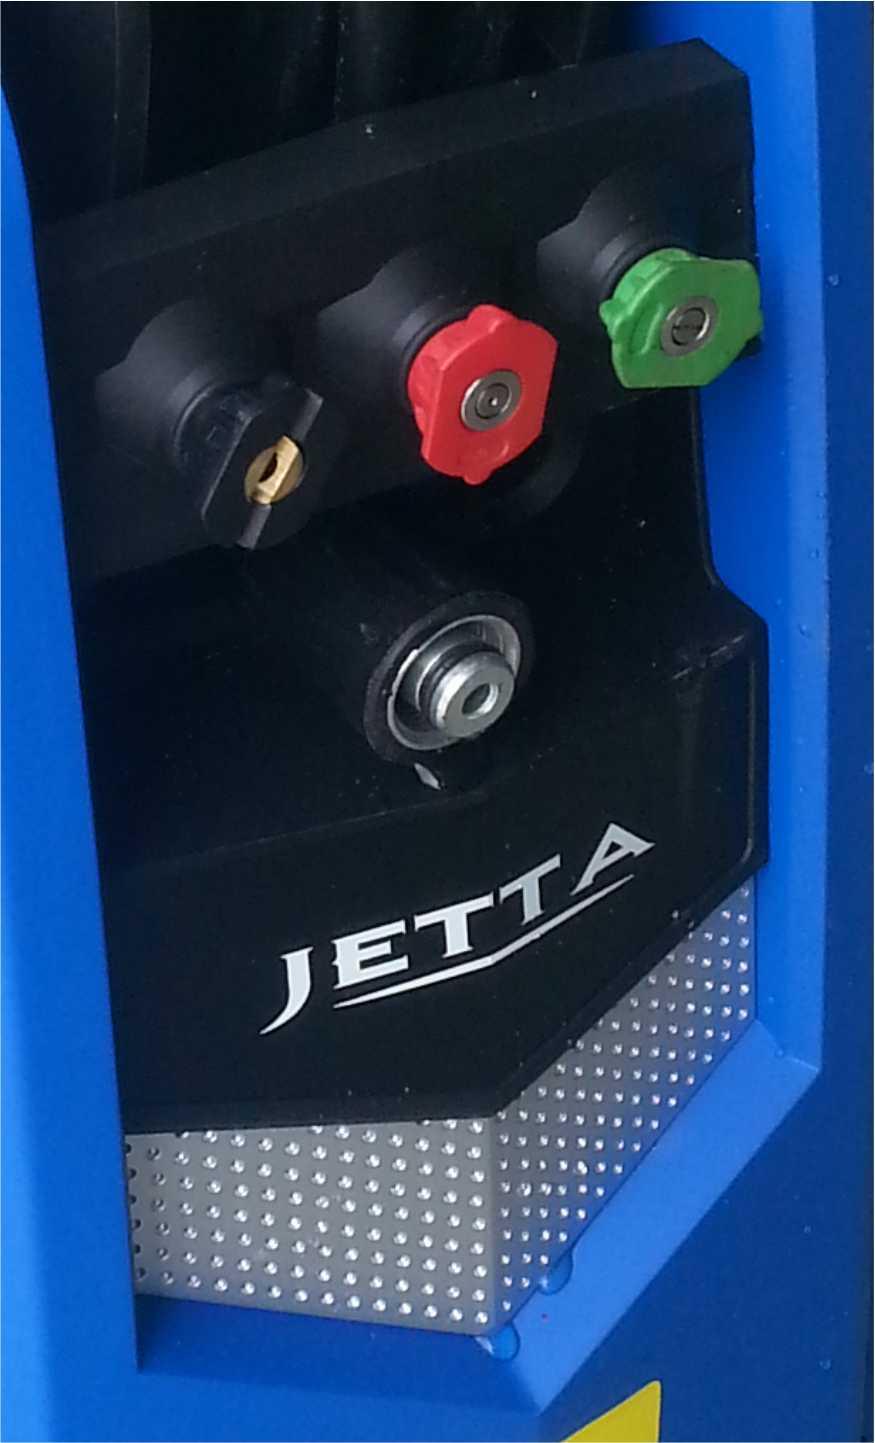 máy rửa xe mini JETTA, Máy rửa xe gia đình JETTA